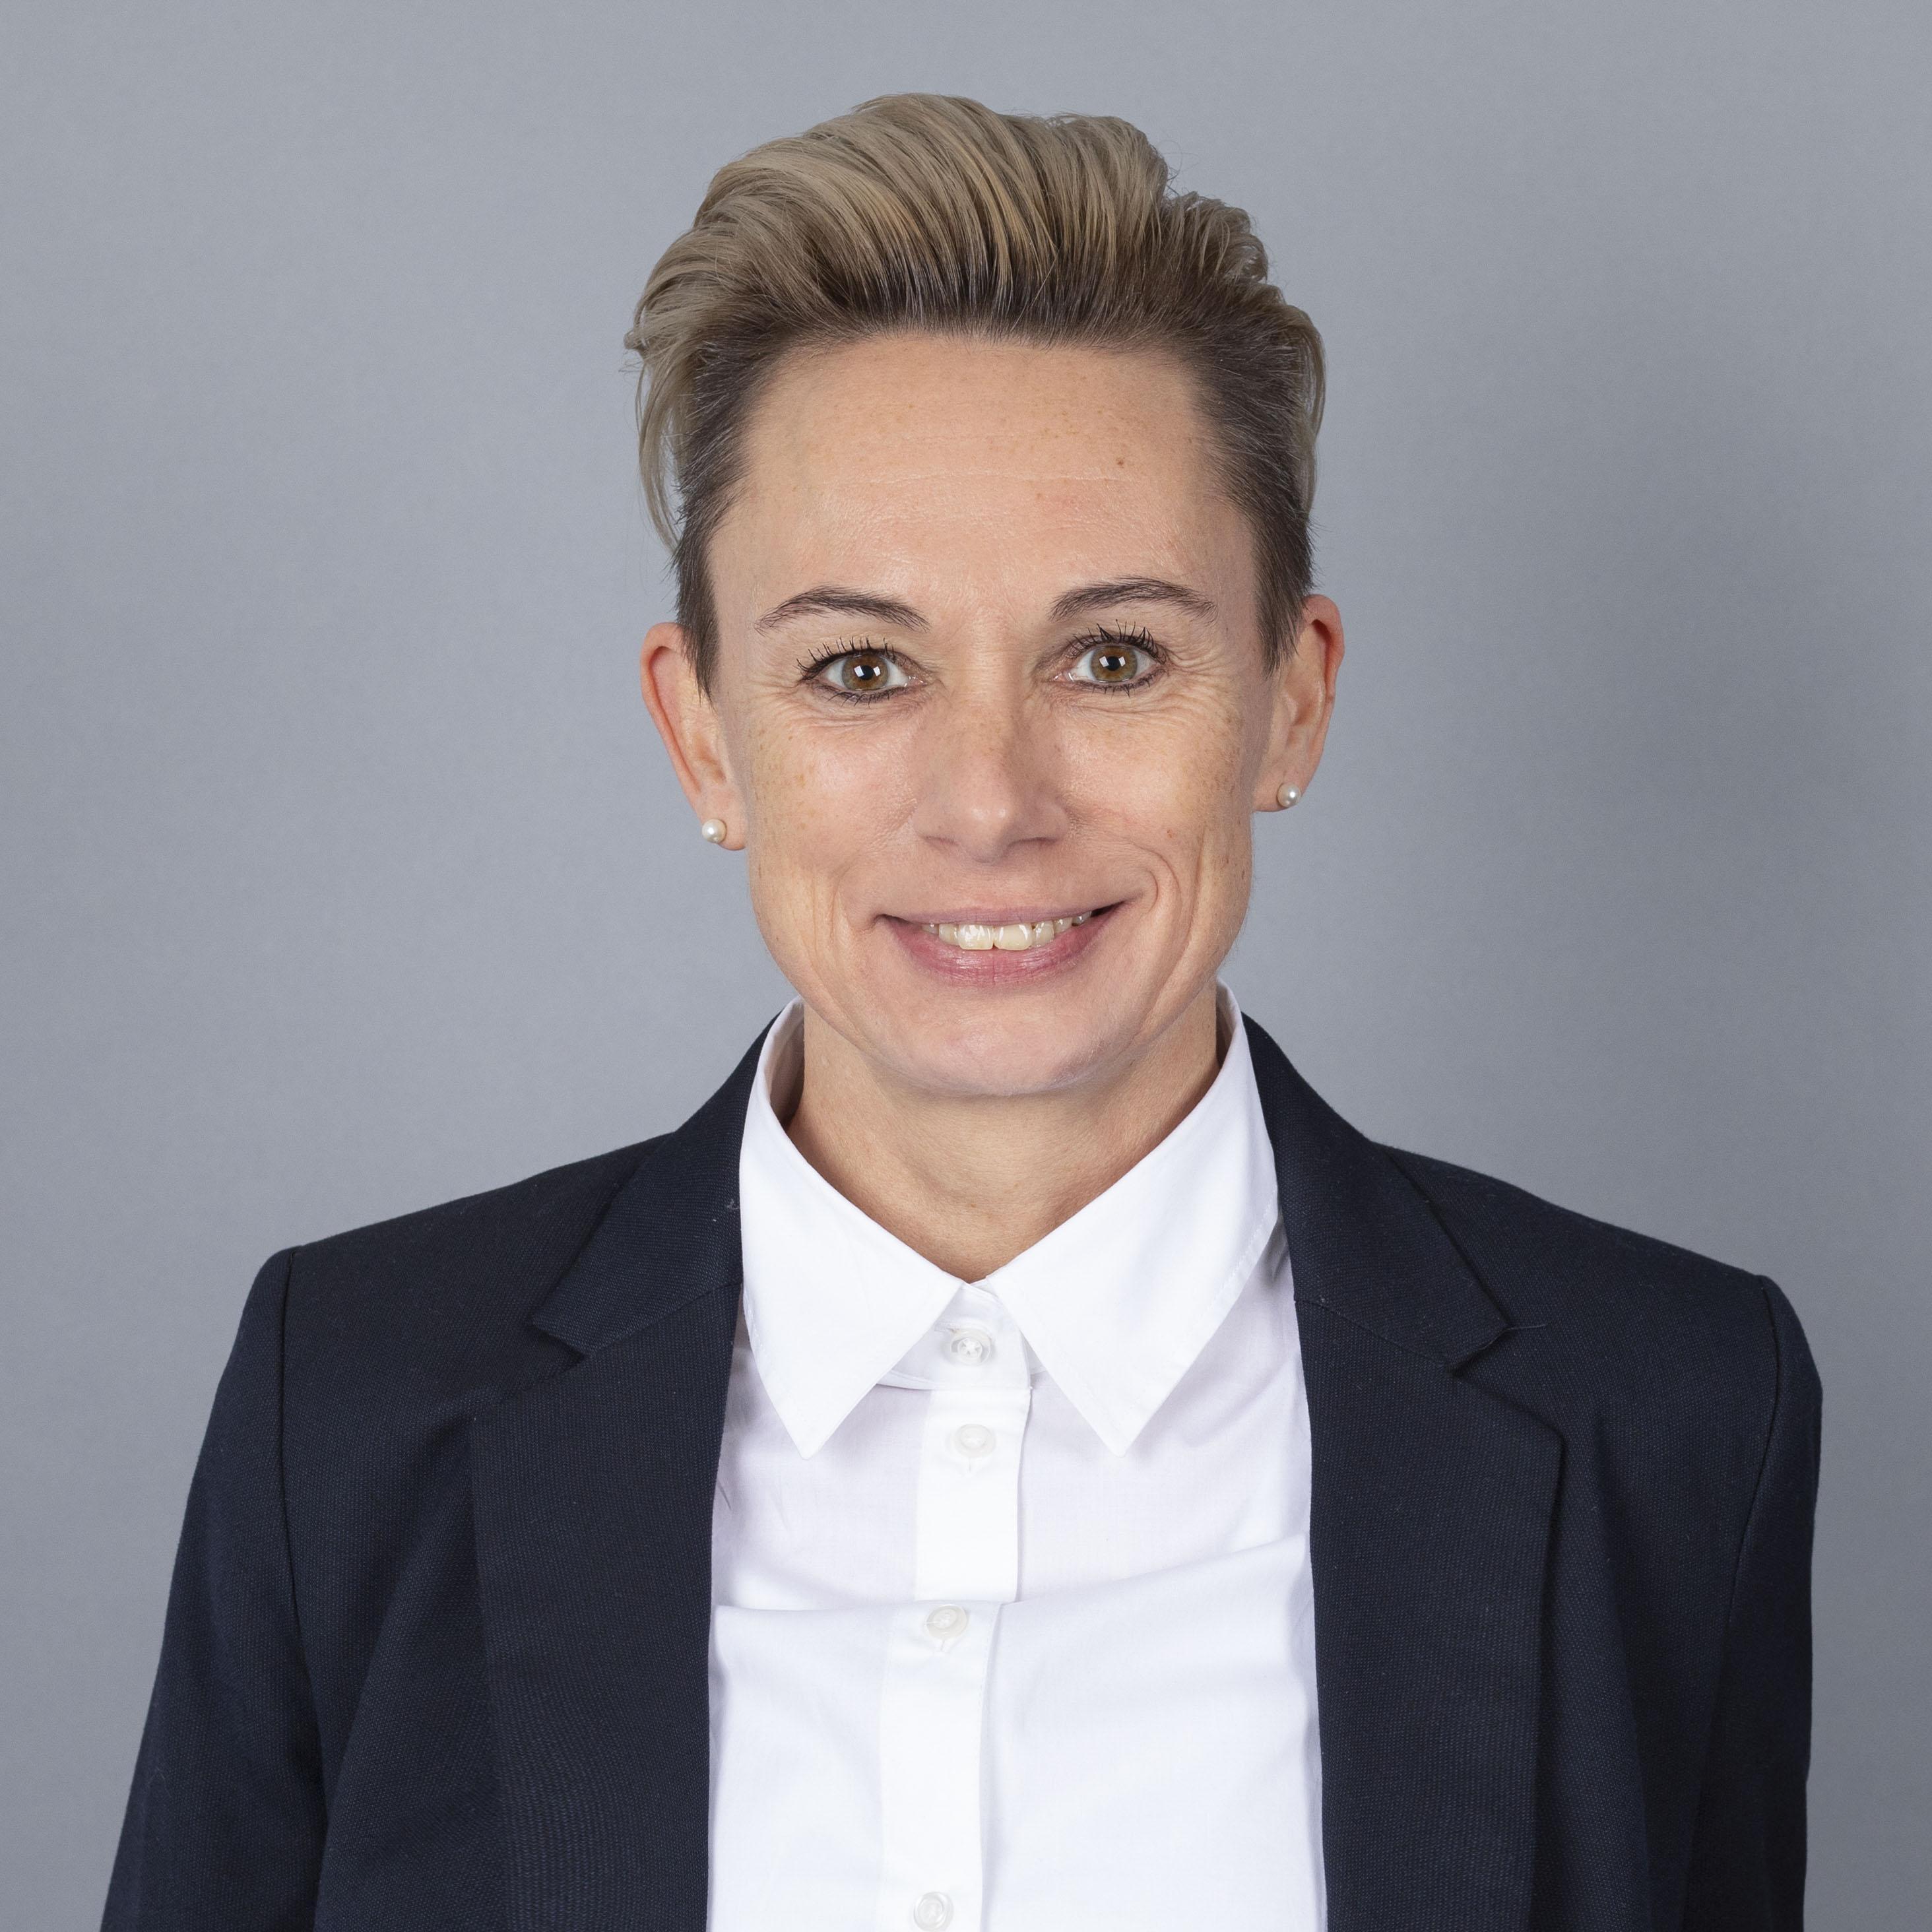 Alexa Schulz